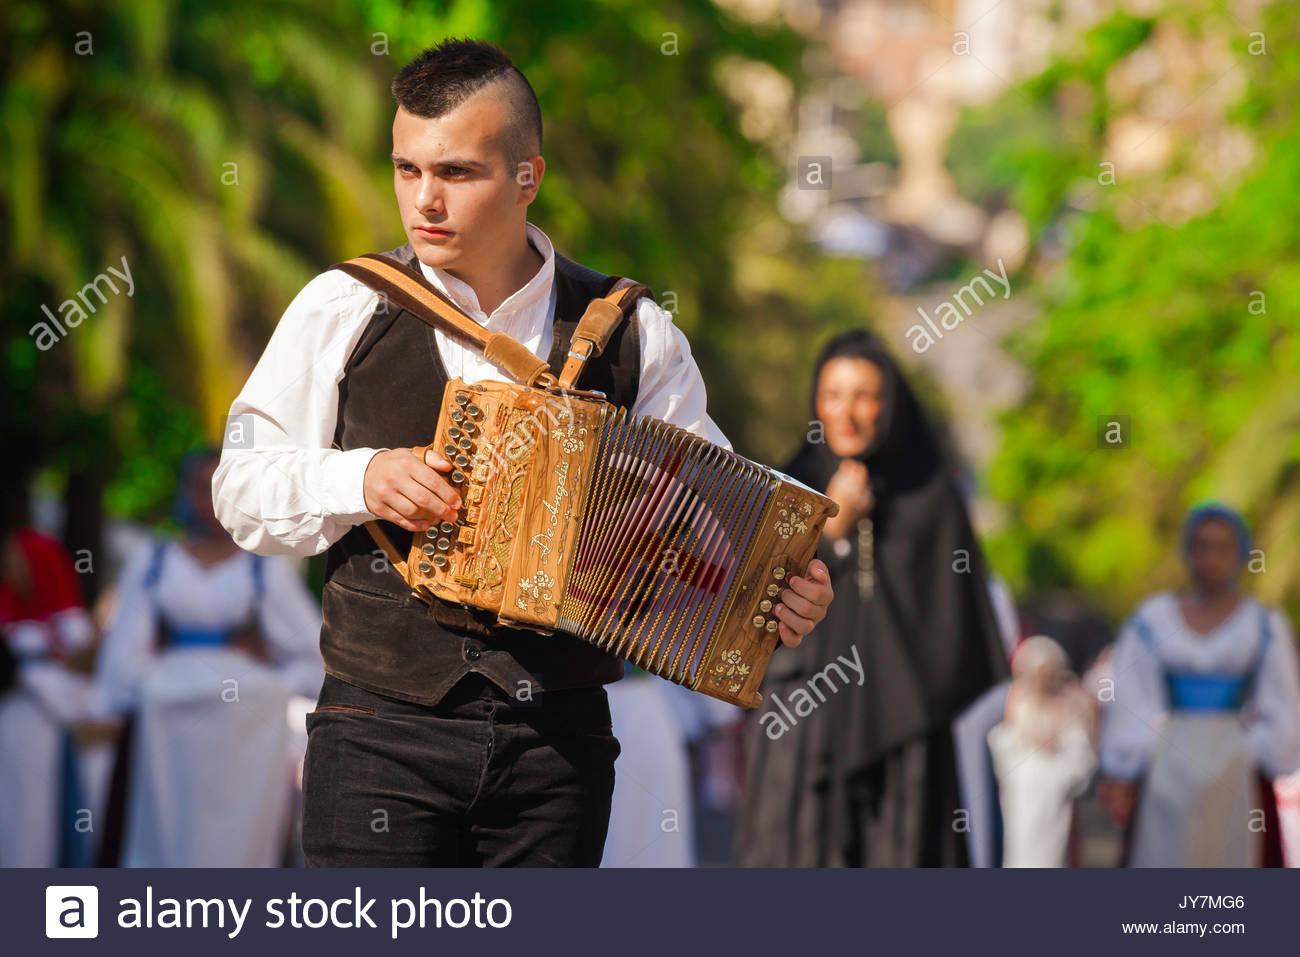 Sassari Cavalcata, portrait d'un jeune accordéoniste jouant dans la grande procession de la la Cavalcata festival à Sassari, Sardaigne. Photo Stock